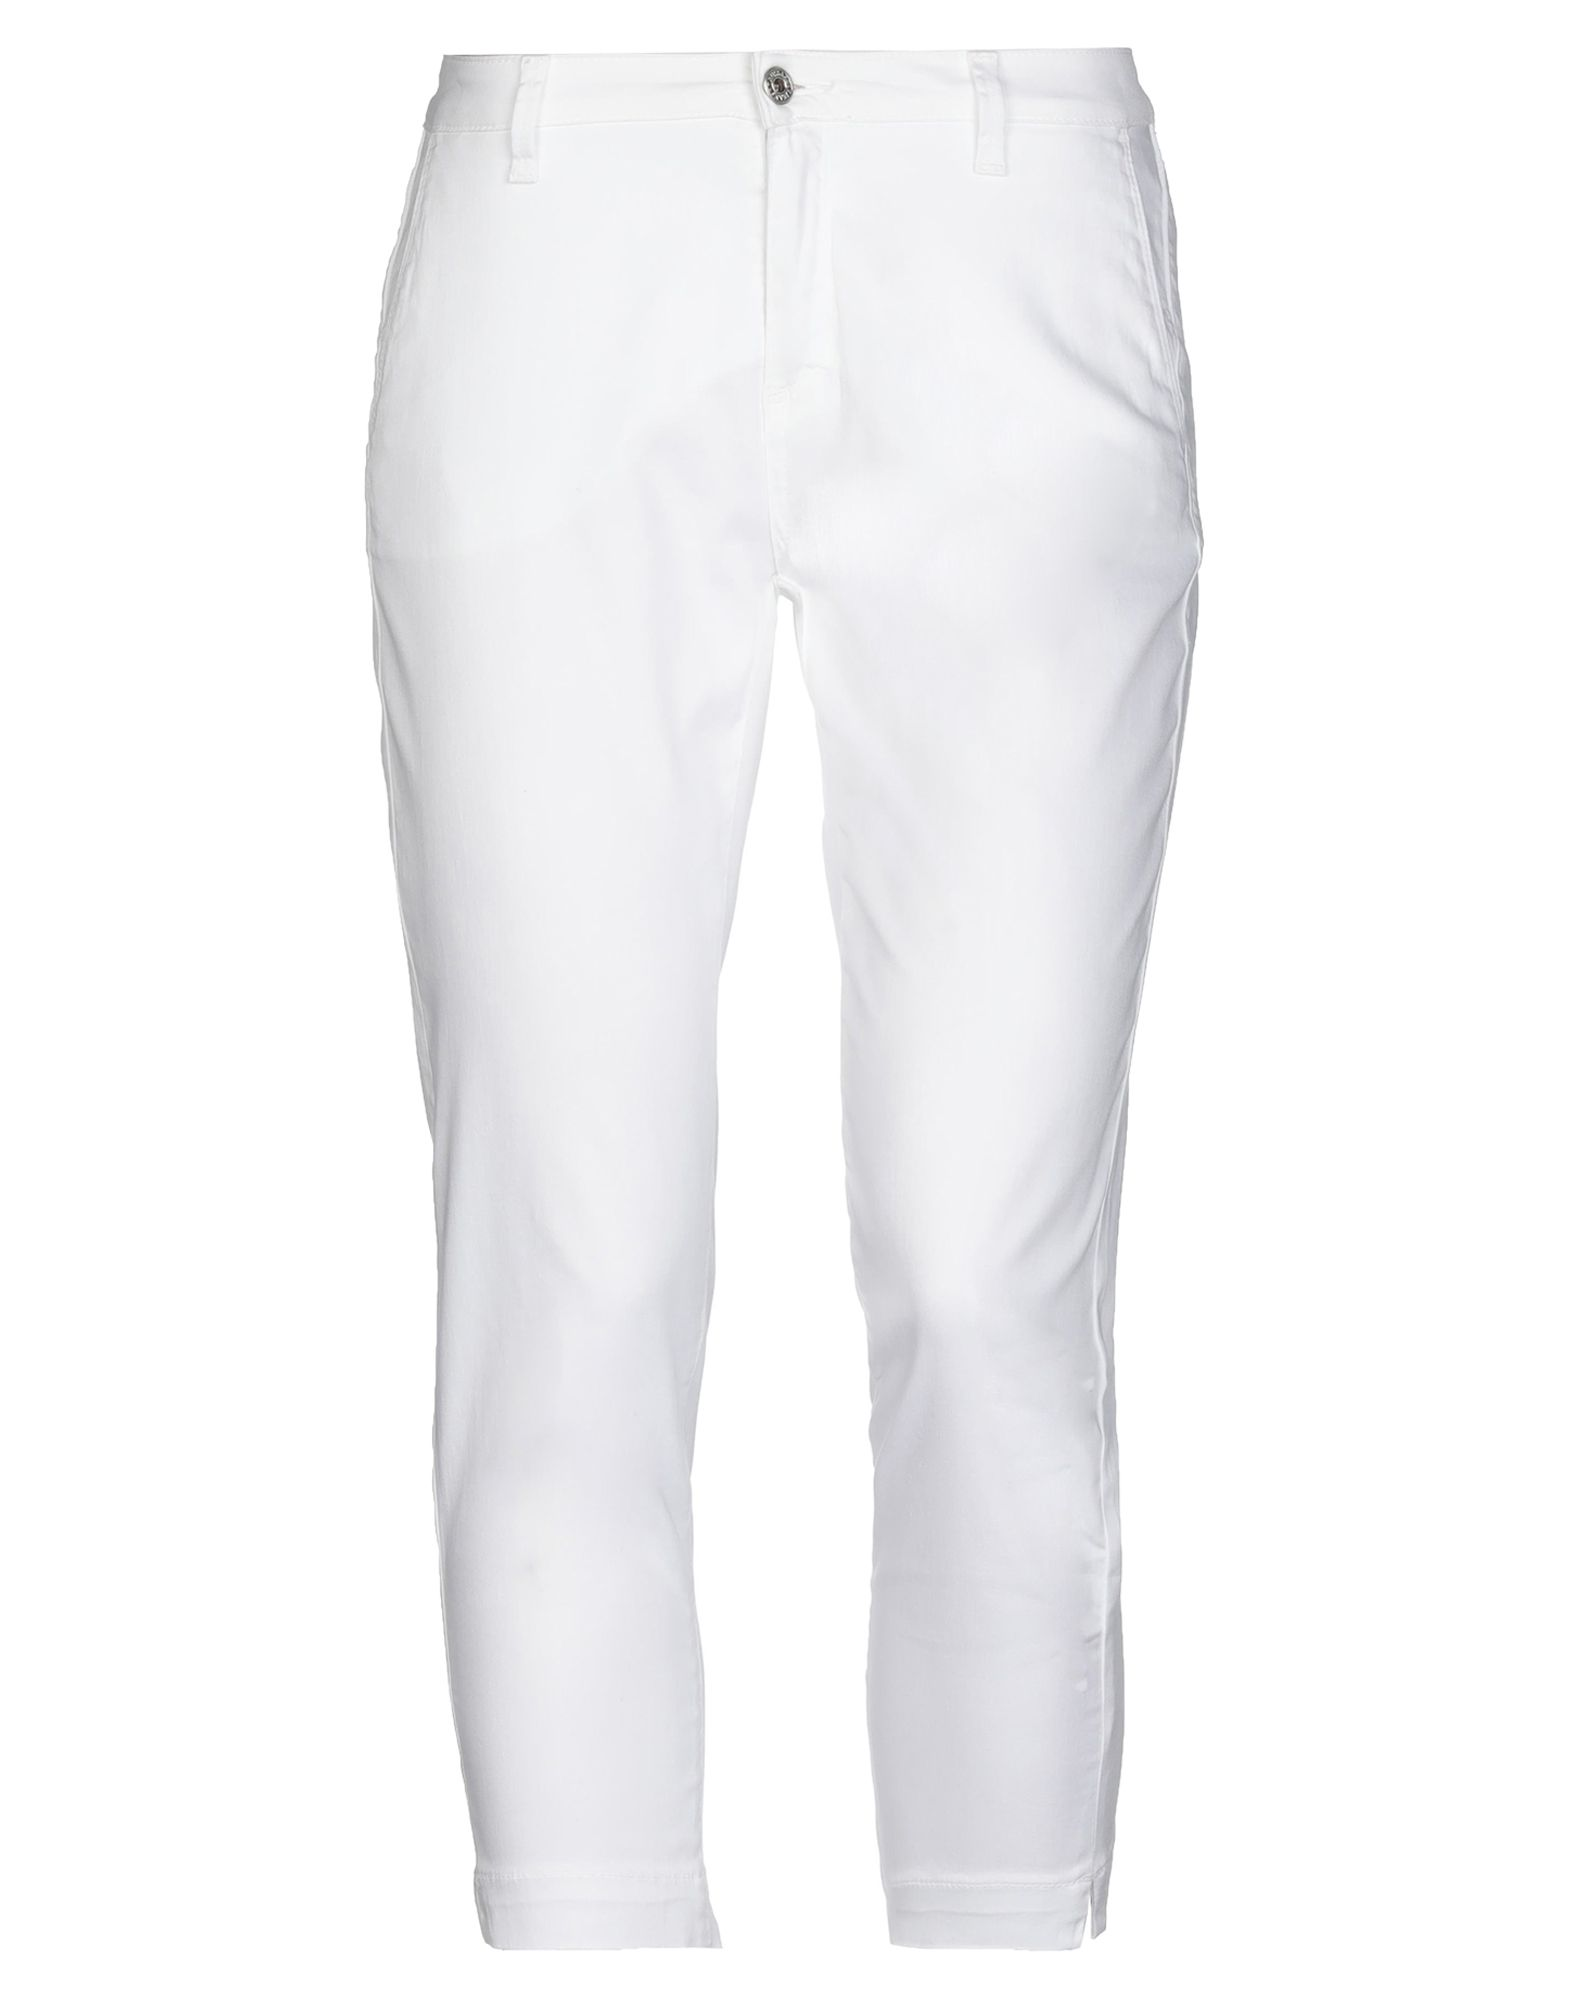 TRUSSARDI JEANS Брюки-капри trussardi jeans брюки капри